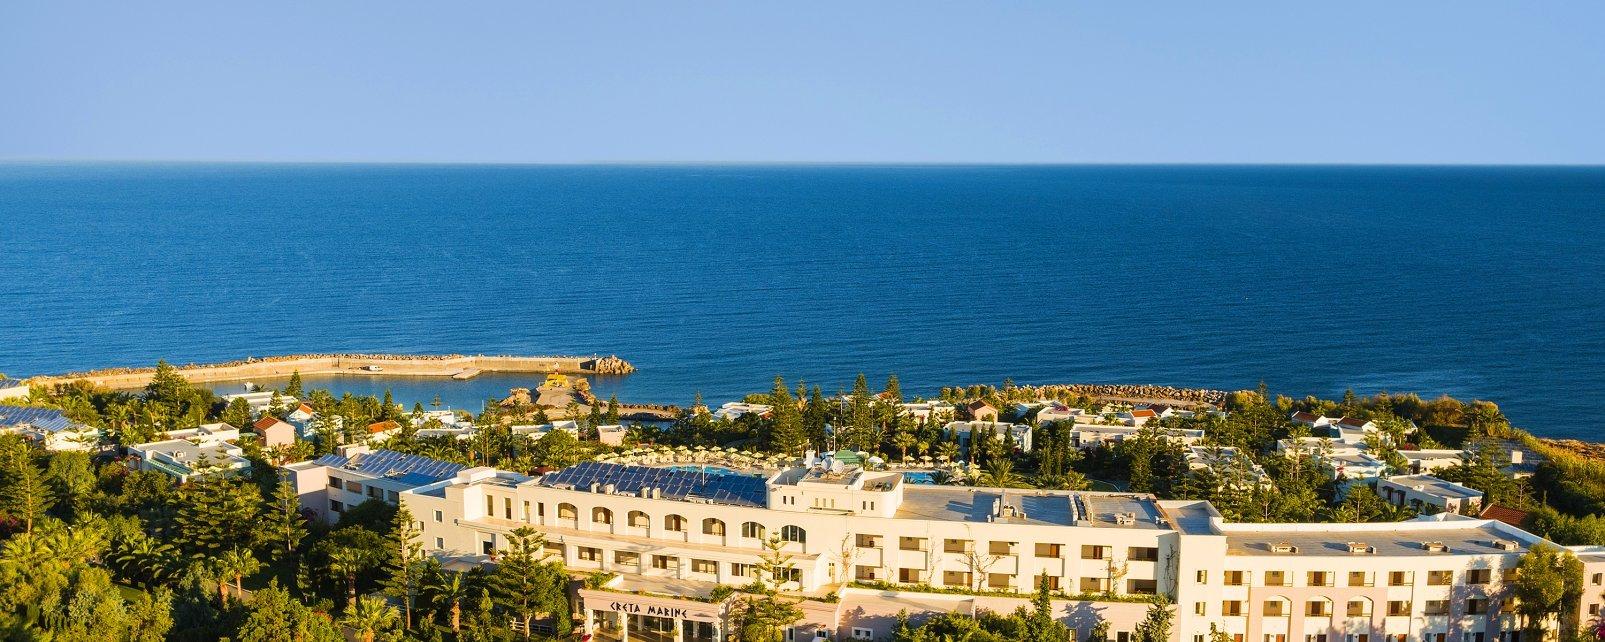 Hôtel Club Eldorador Iberostar Creta Marine